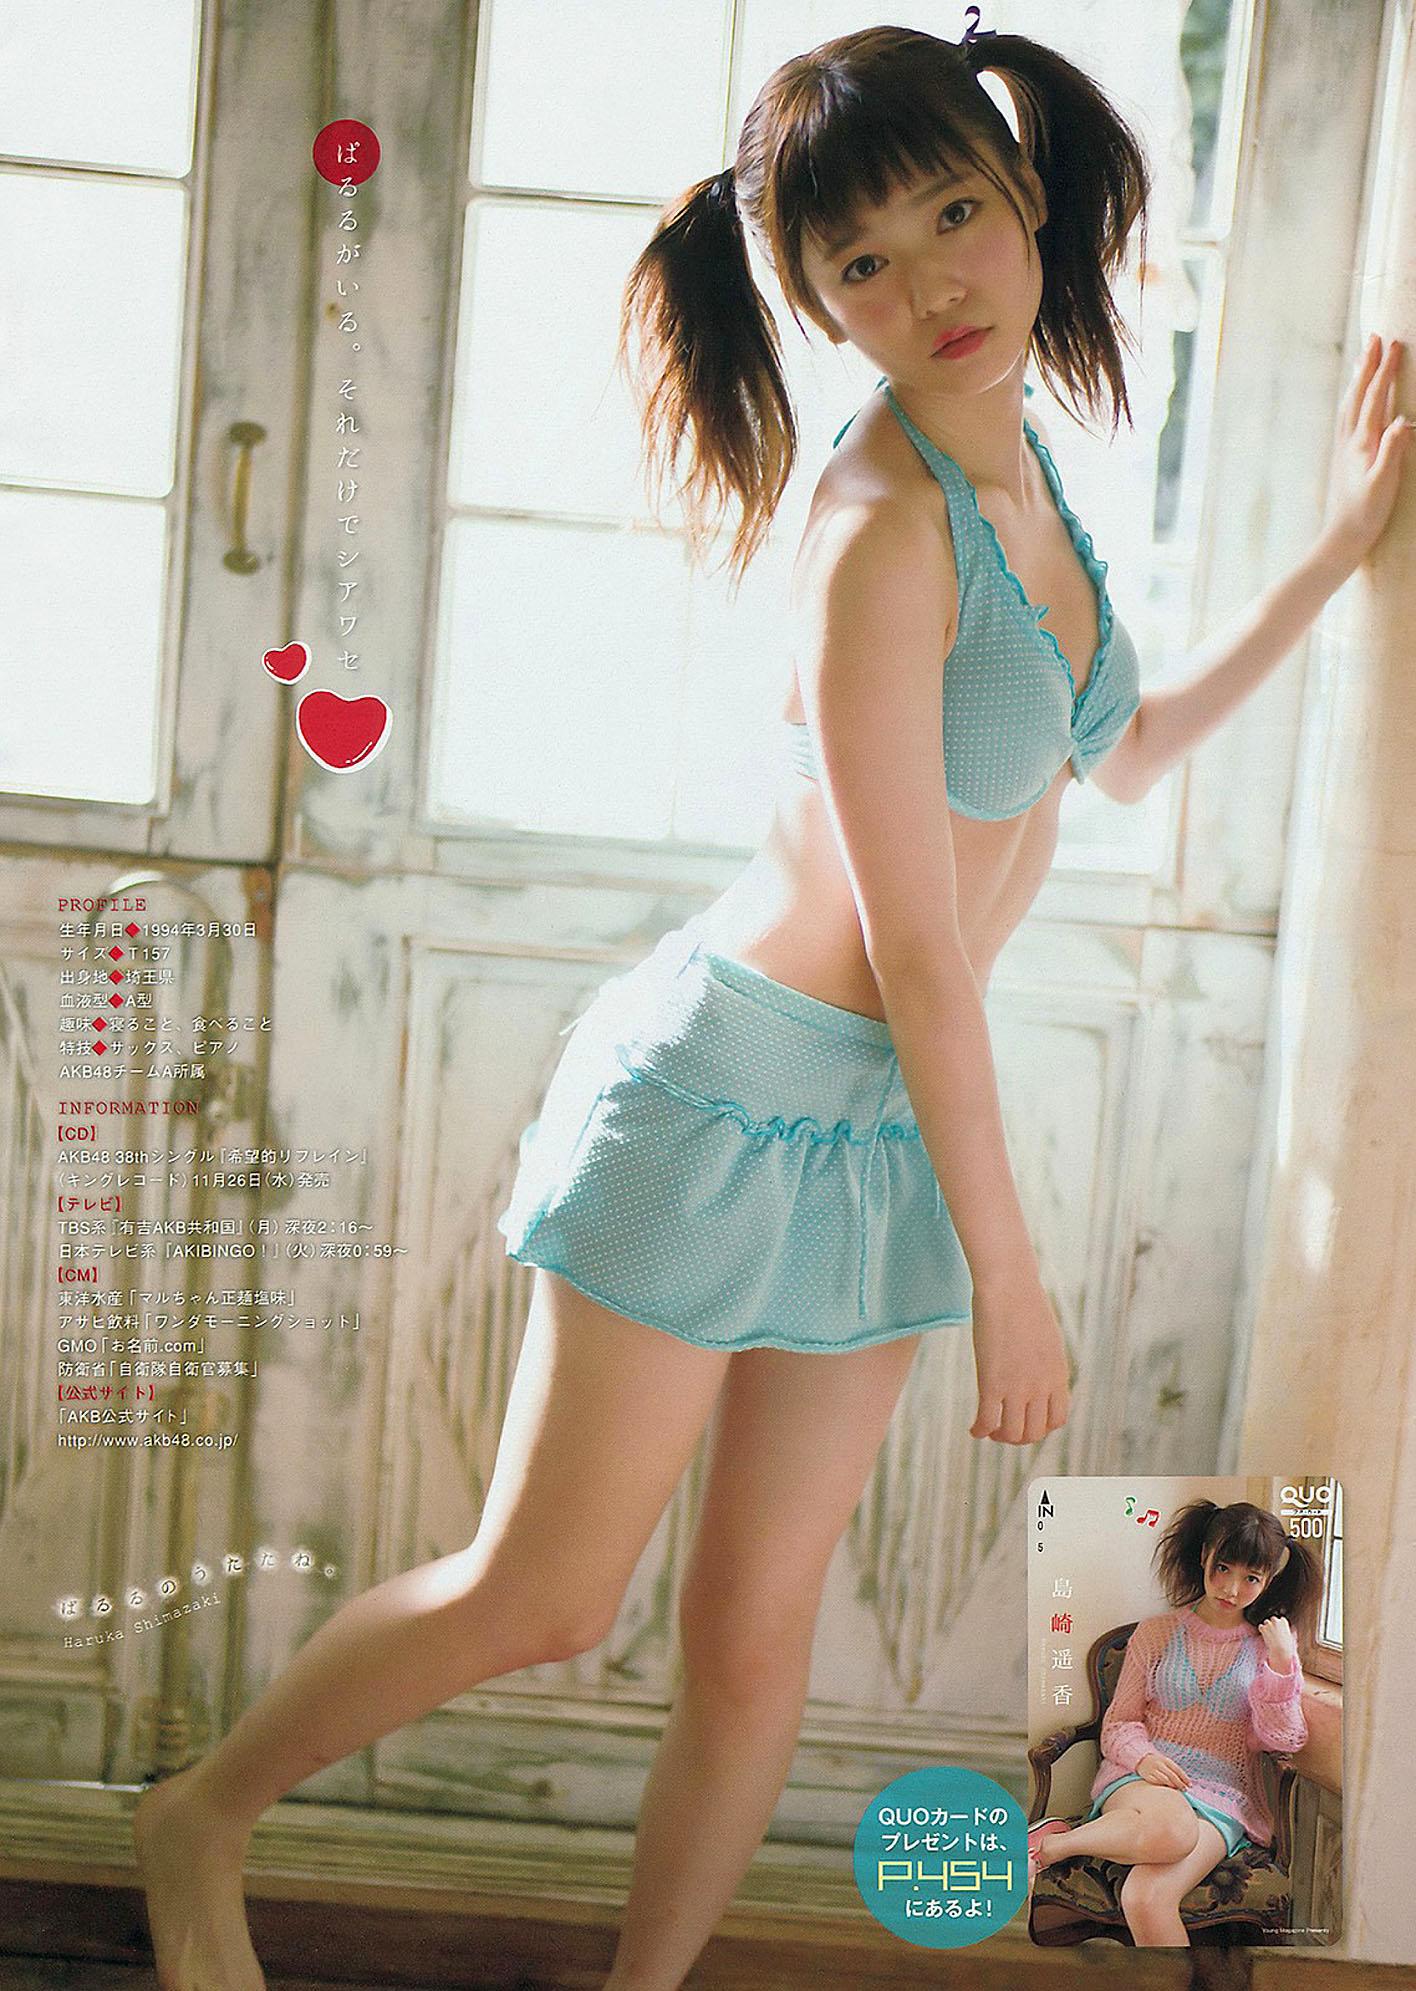 HShimazaki Young Magazine 141201 07.jpg